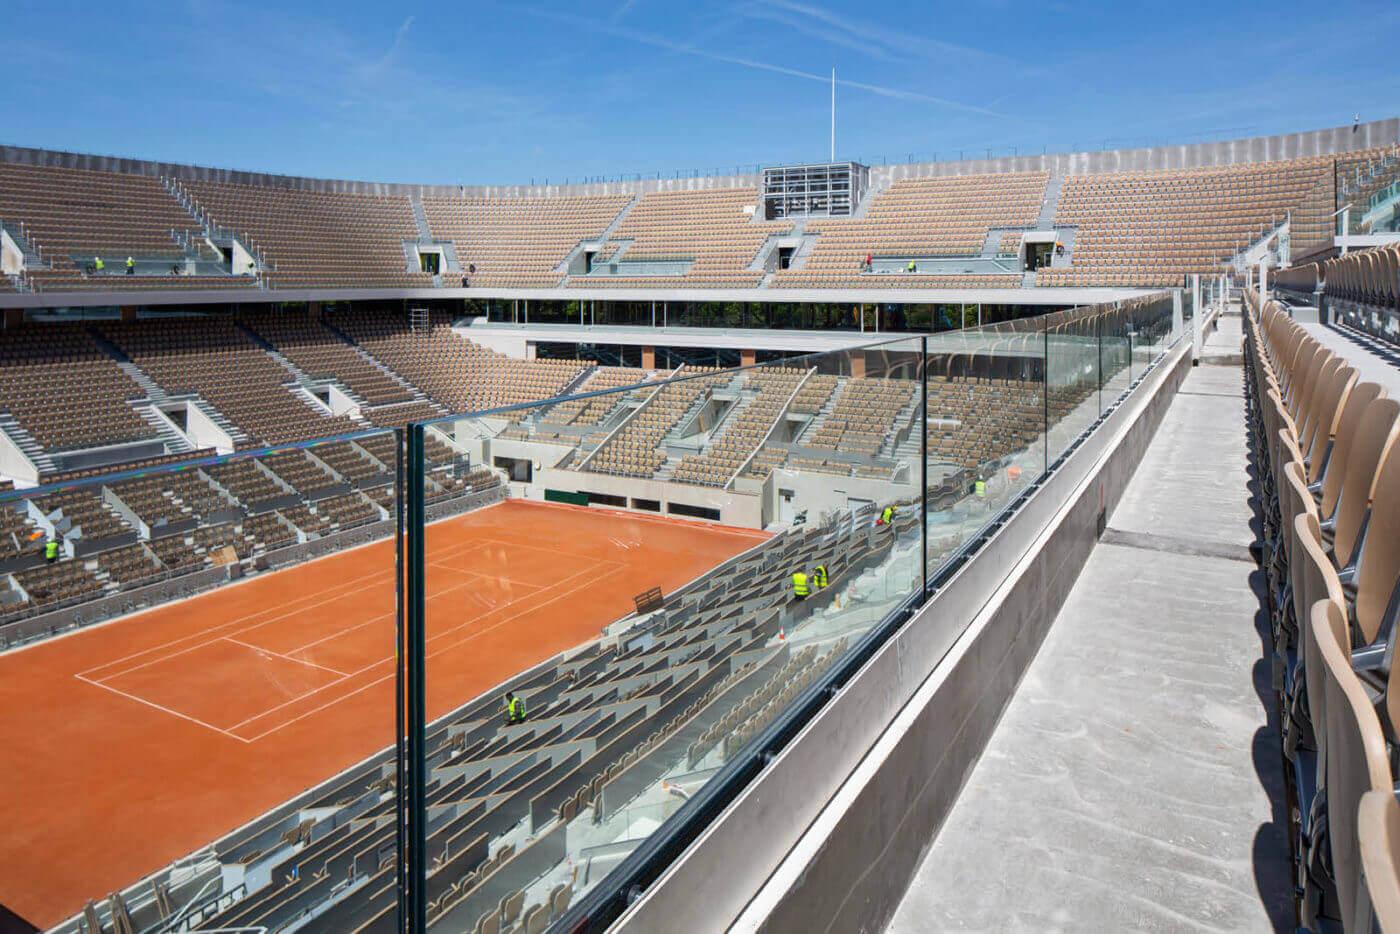 Stadio Roland Garros - Balaustra in alluminio e Vetro Ninfa